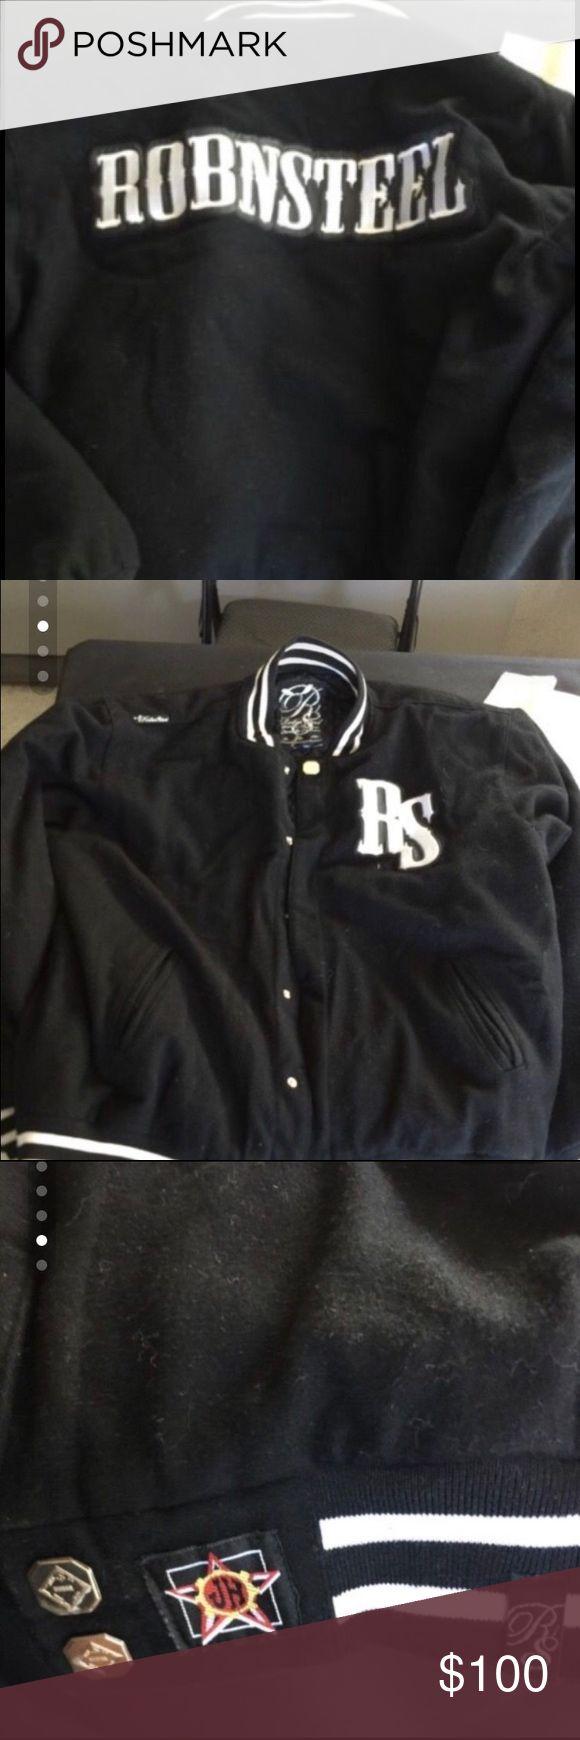 ROBNSTEEL Lettermans jacket Size XL Rob N Steel Lettermans jacket Jackets & Coats Utility Jackets